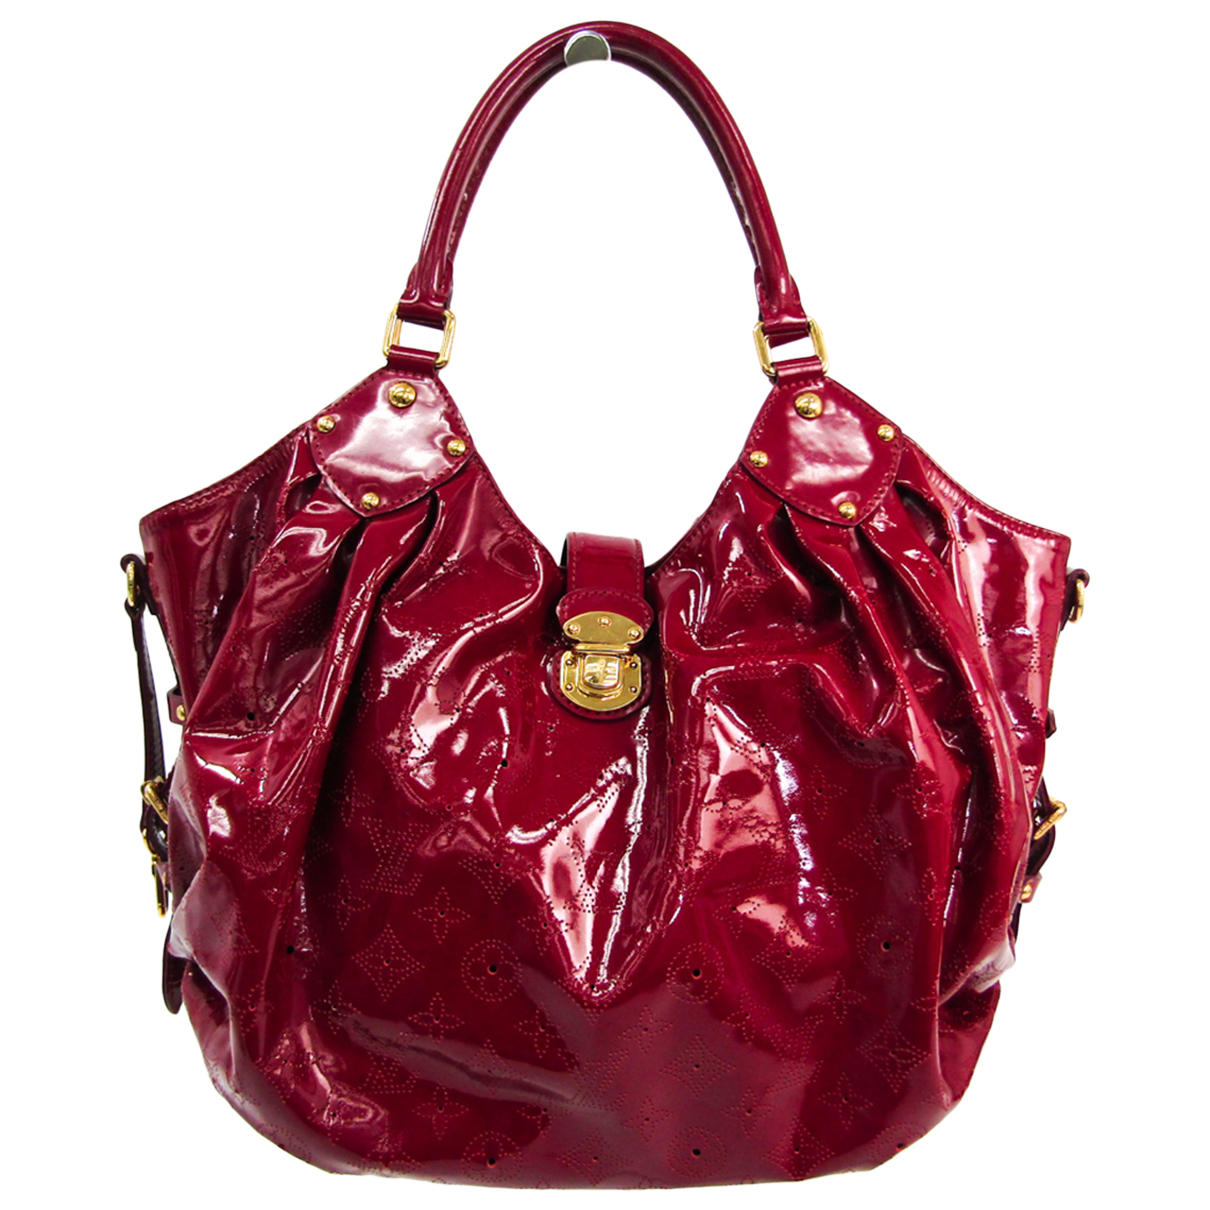 Louis Vuitton - Sac a main Mahina pour femme en cuir verni - rose